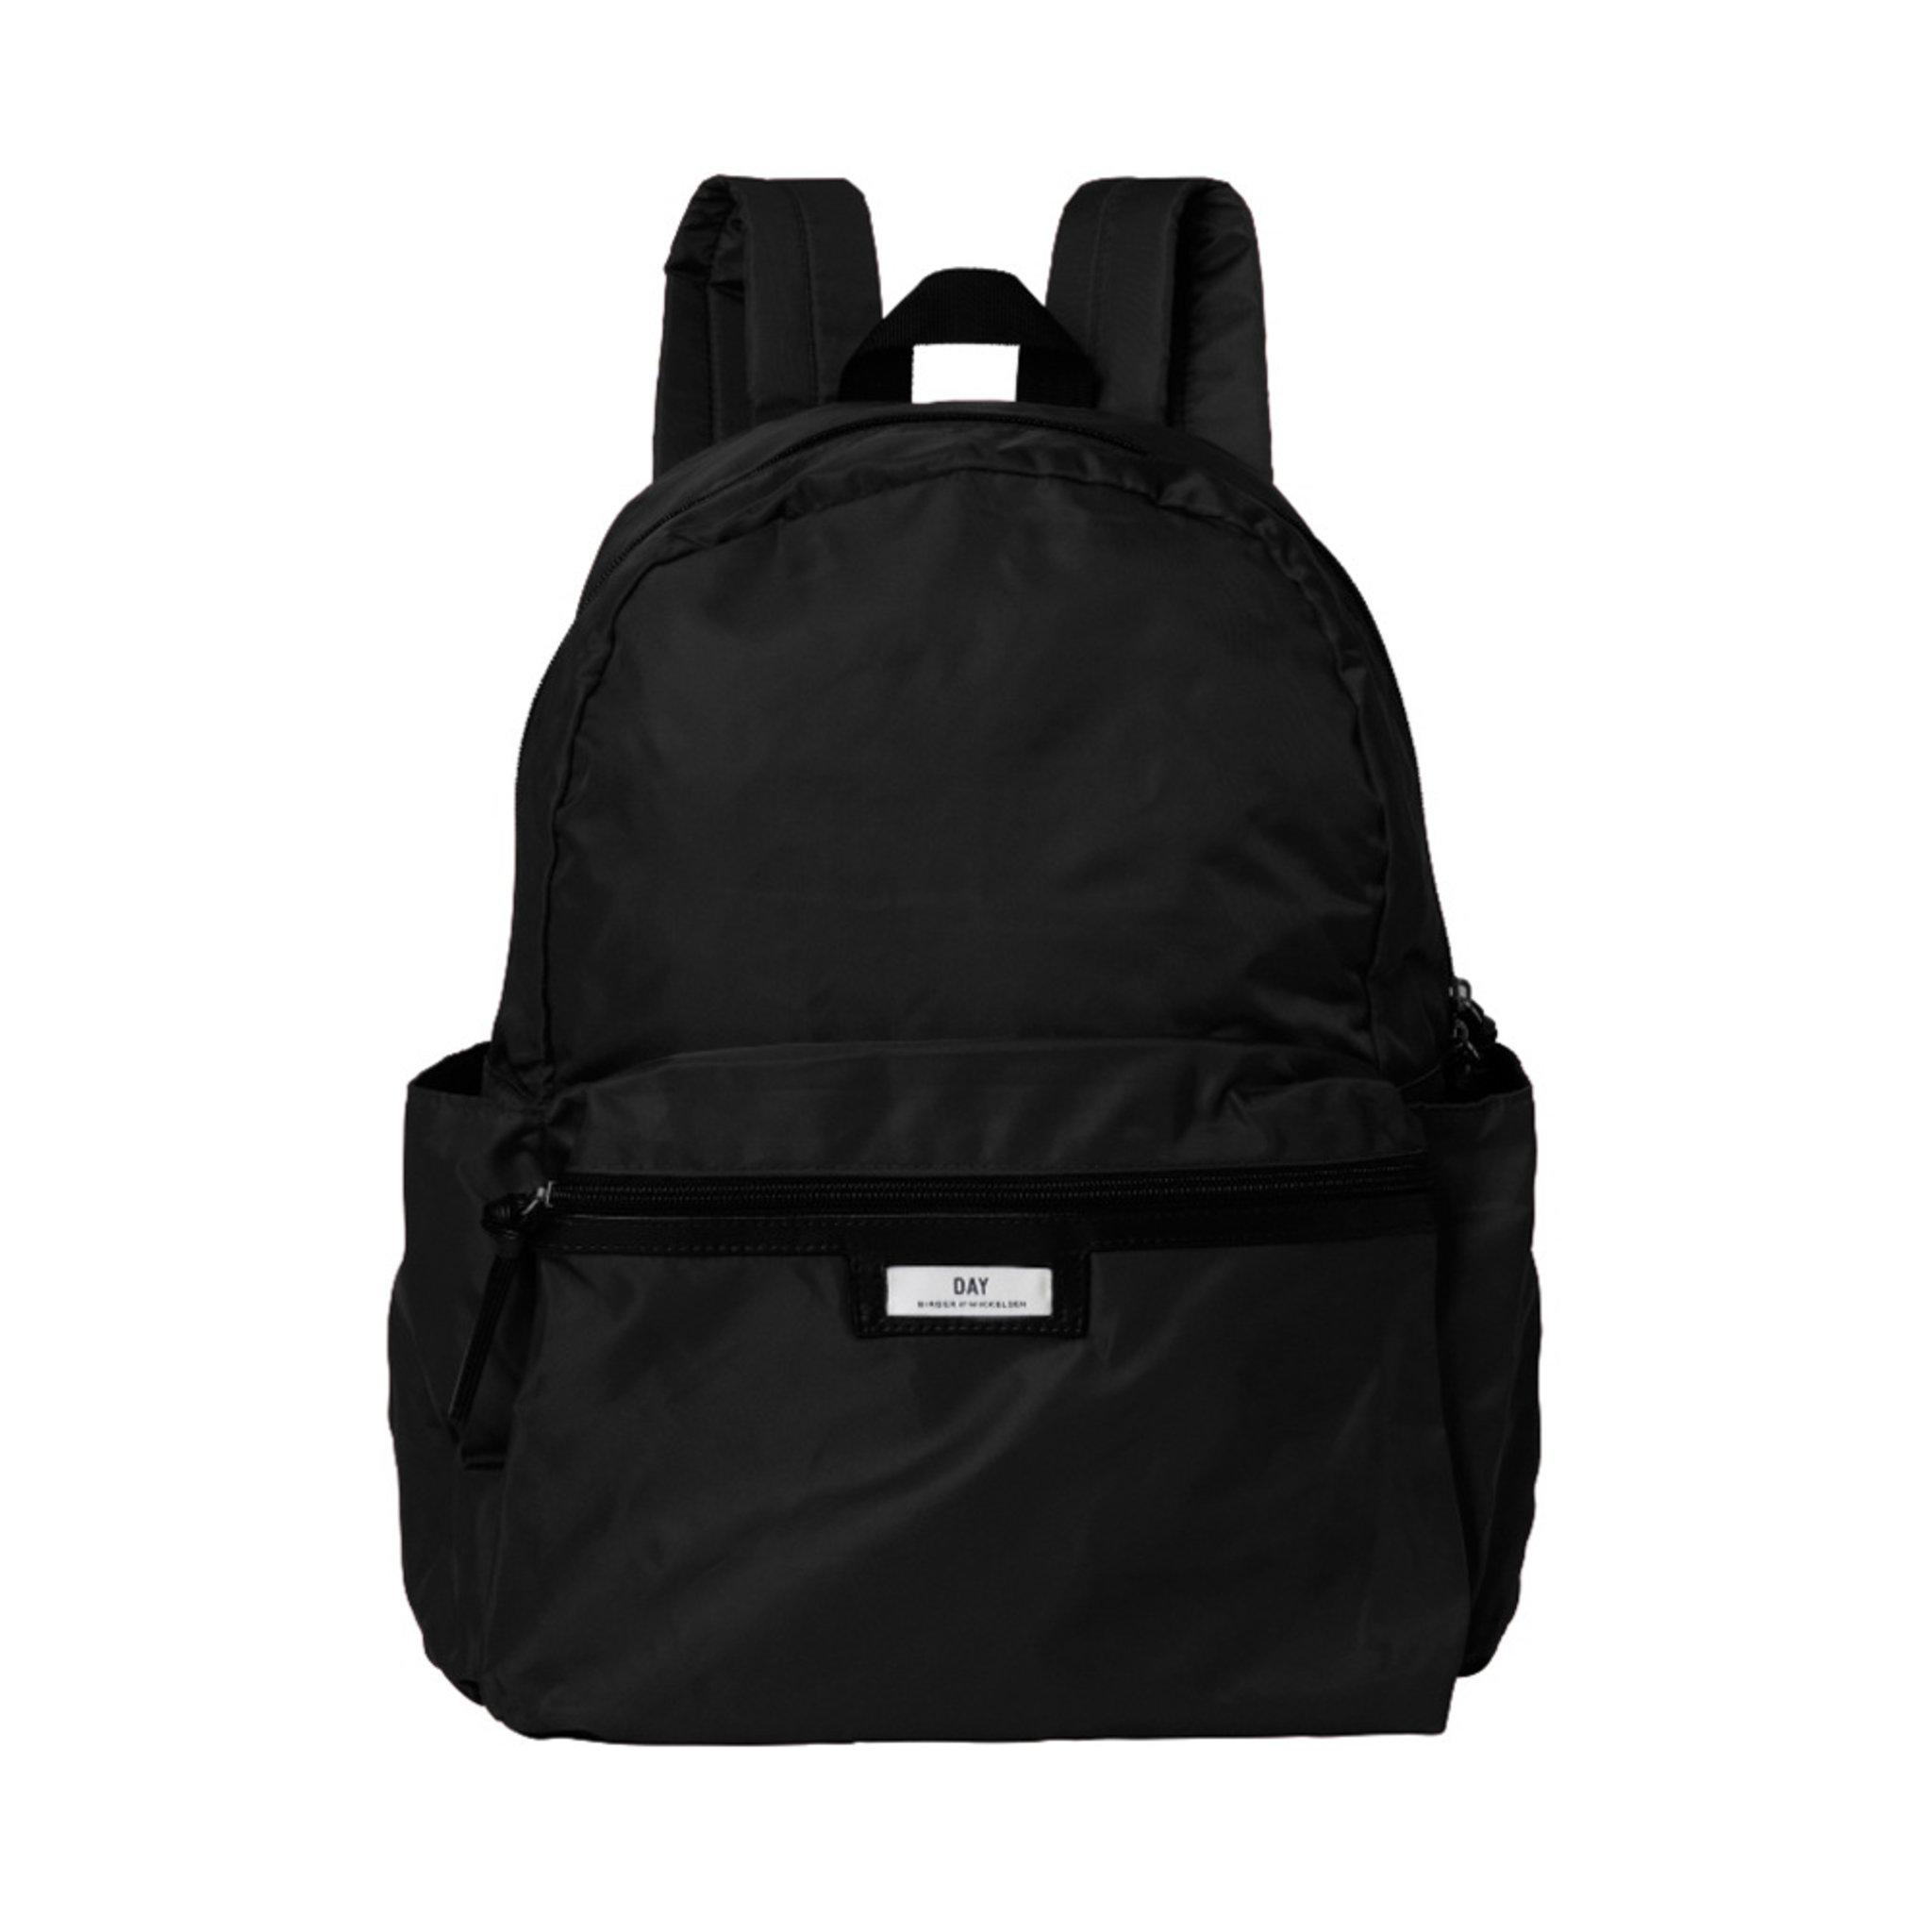 Handla online DAY ET Gweneth ryggsäck i textil, Svart Day et